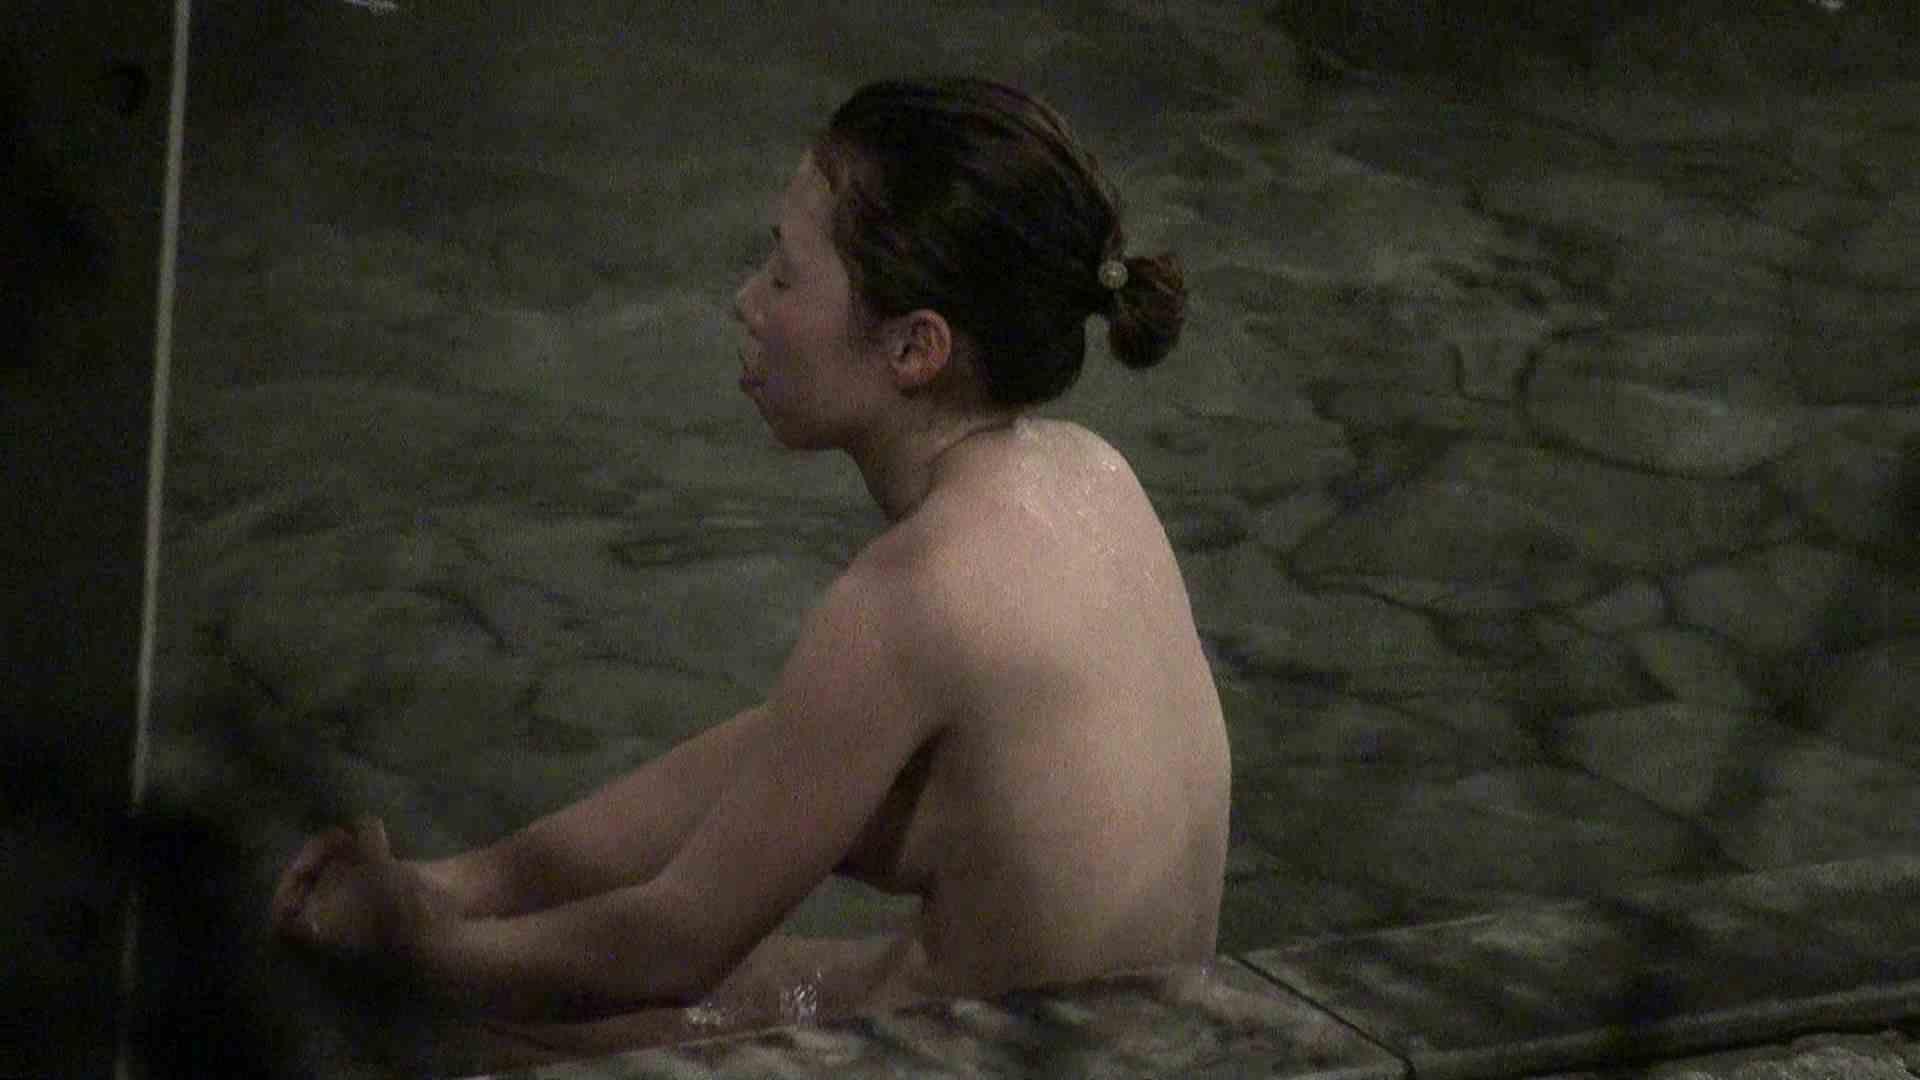 Aquaな露天風呂Vol.391 美しいOLの裸体 えろ無修正画像 99pic 14